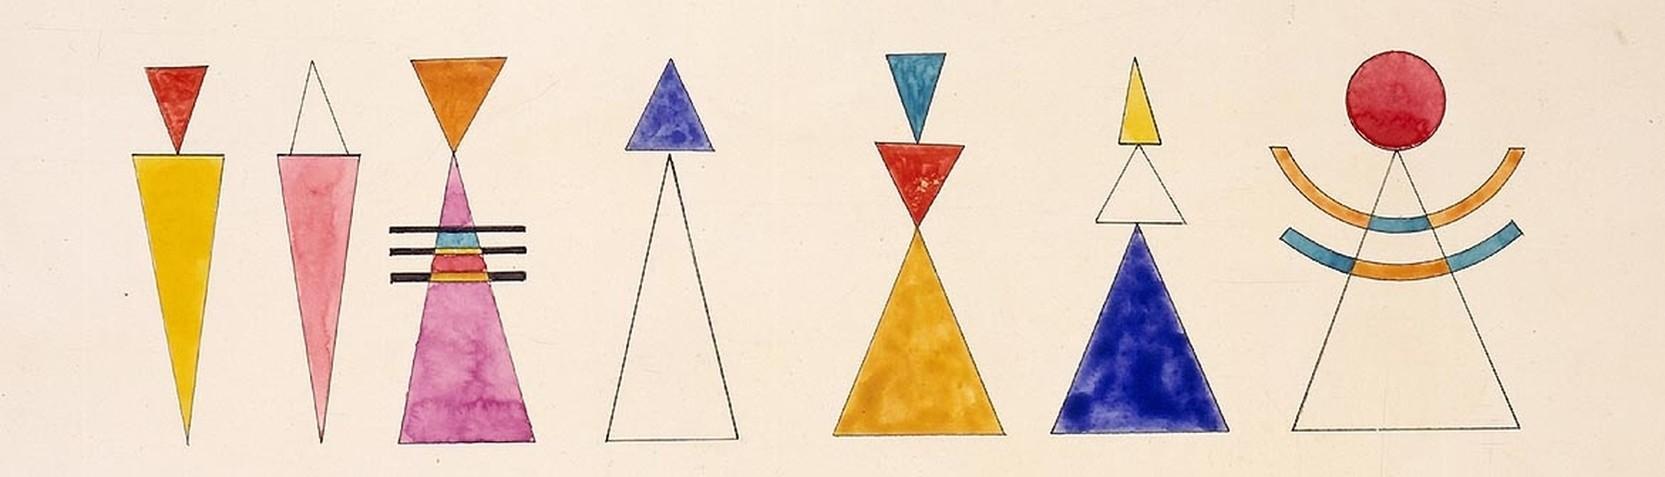 Artistas - Wassily Kandinsky